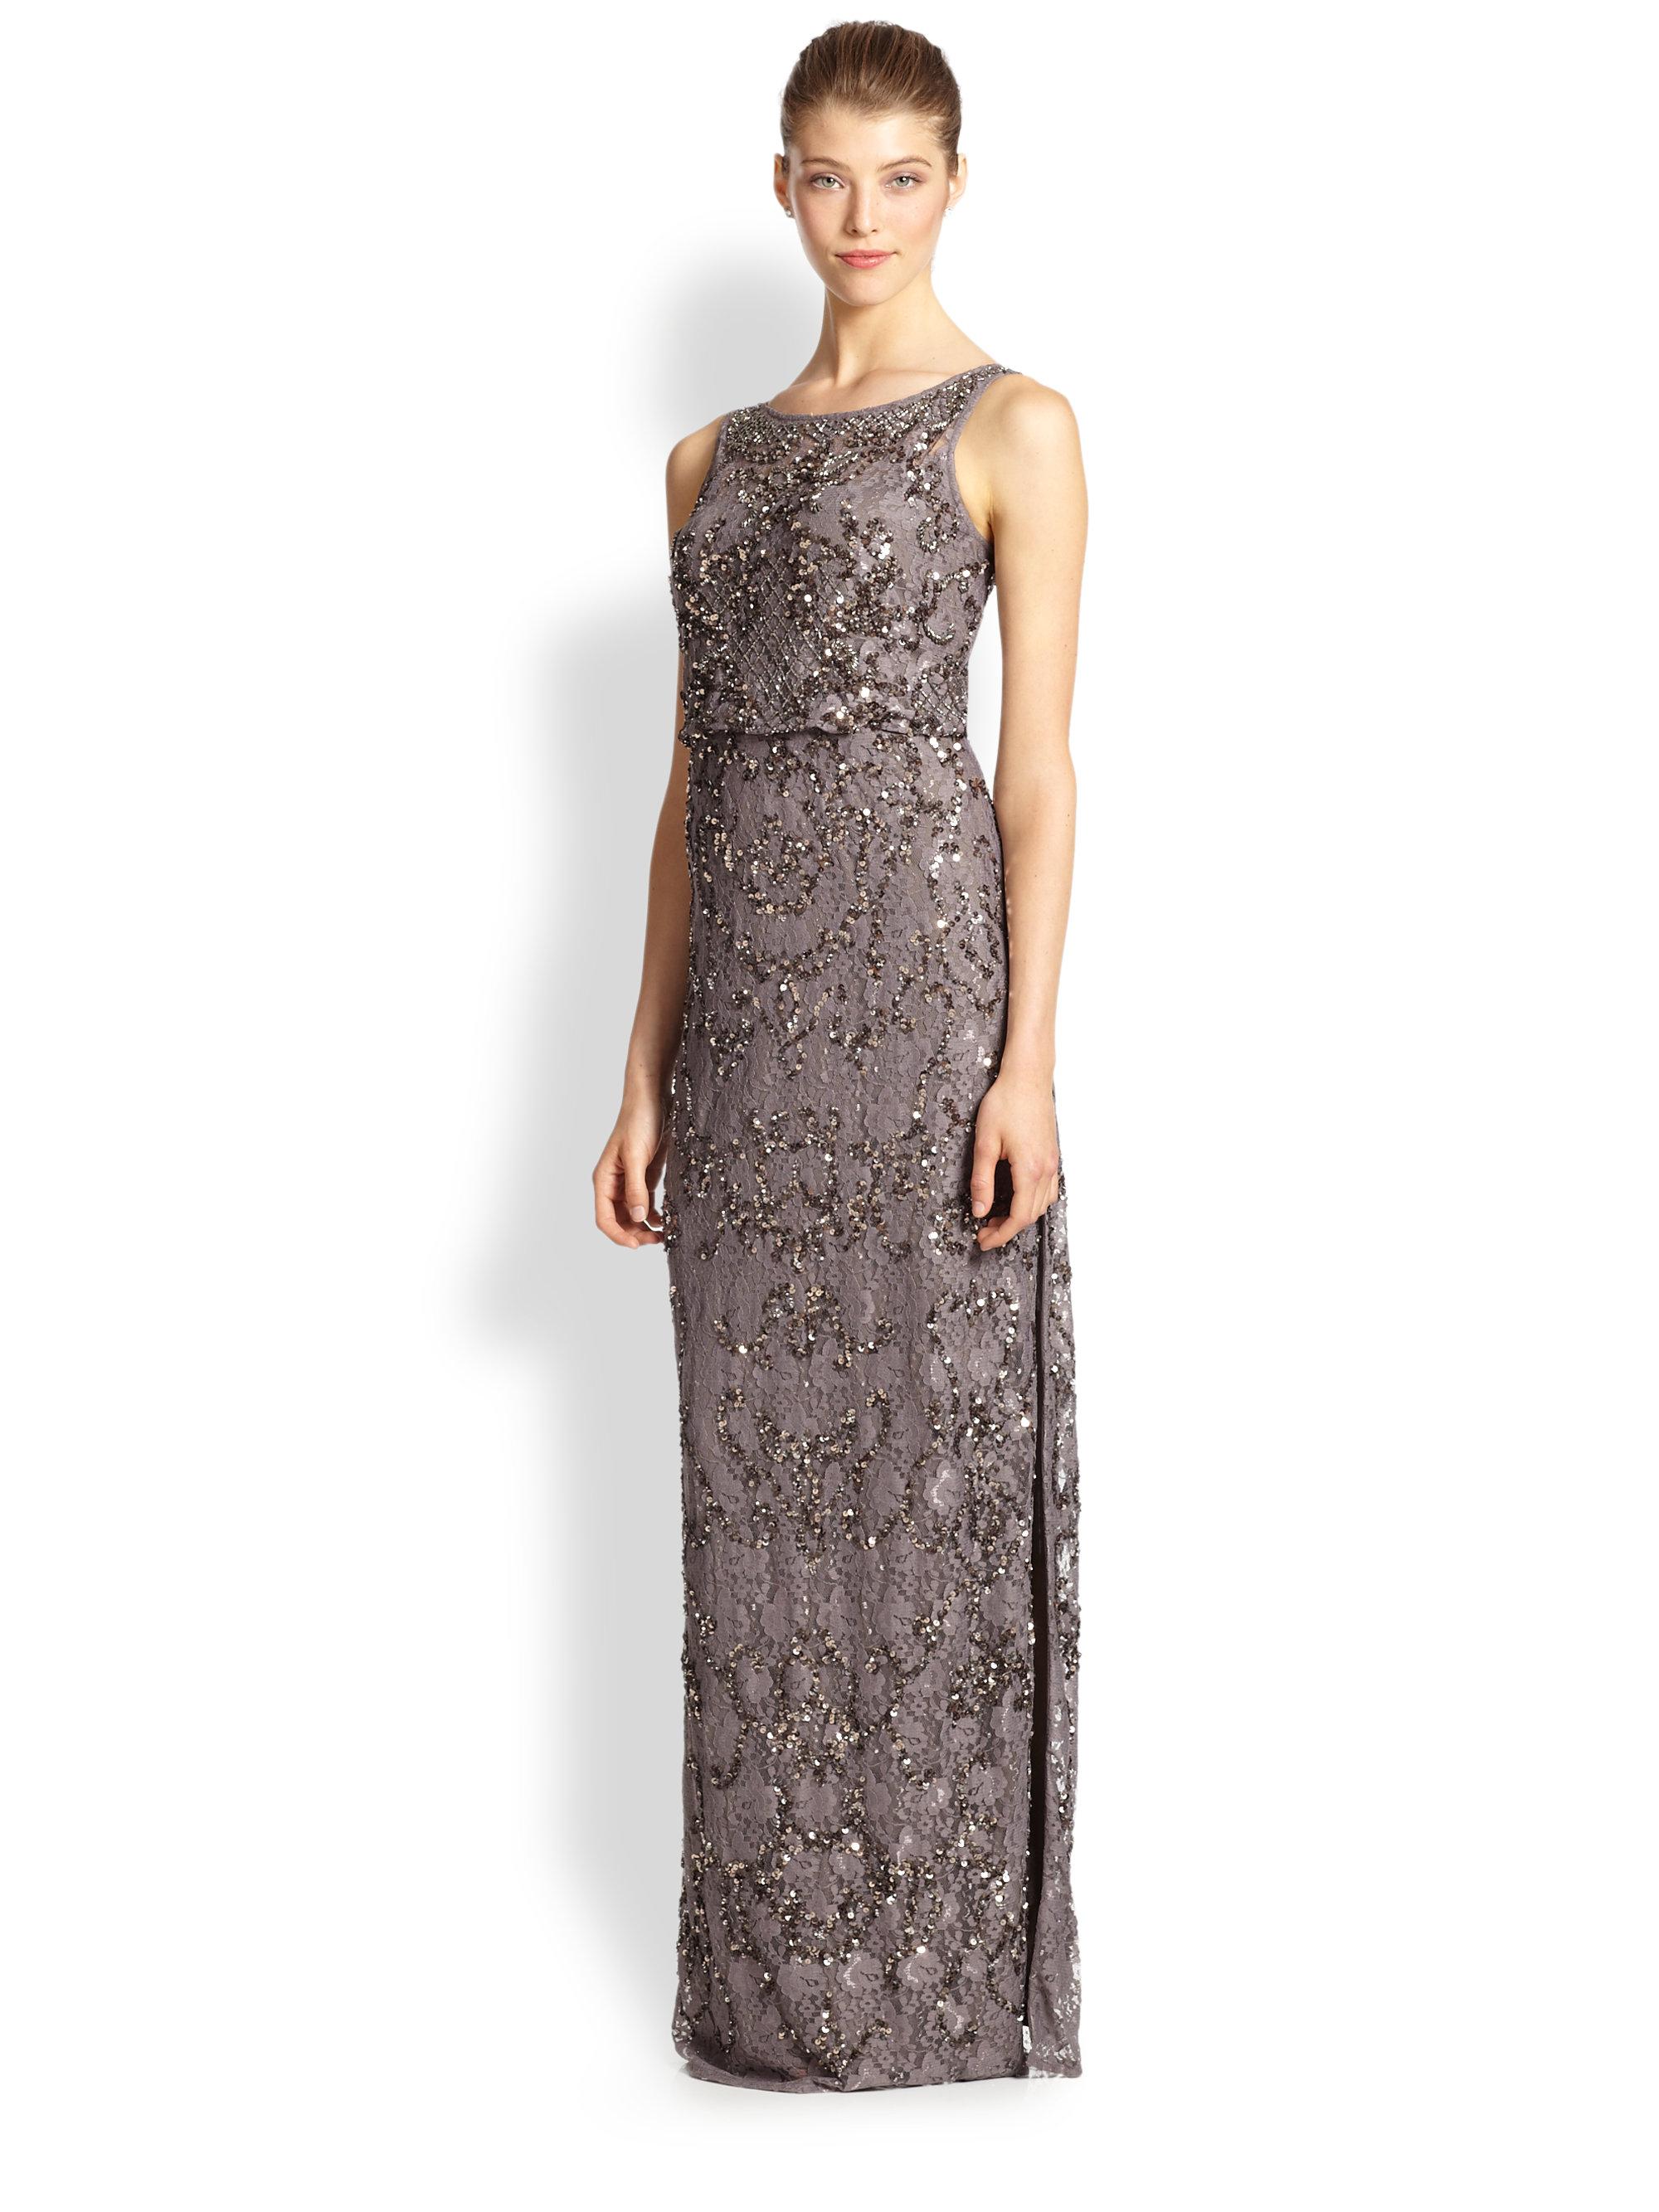 Lyst - Aidan Mattox Beaded Lace Gown in Metallic